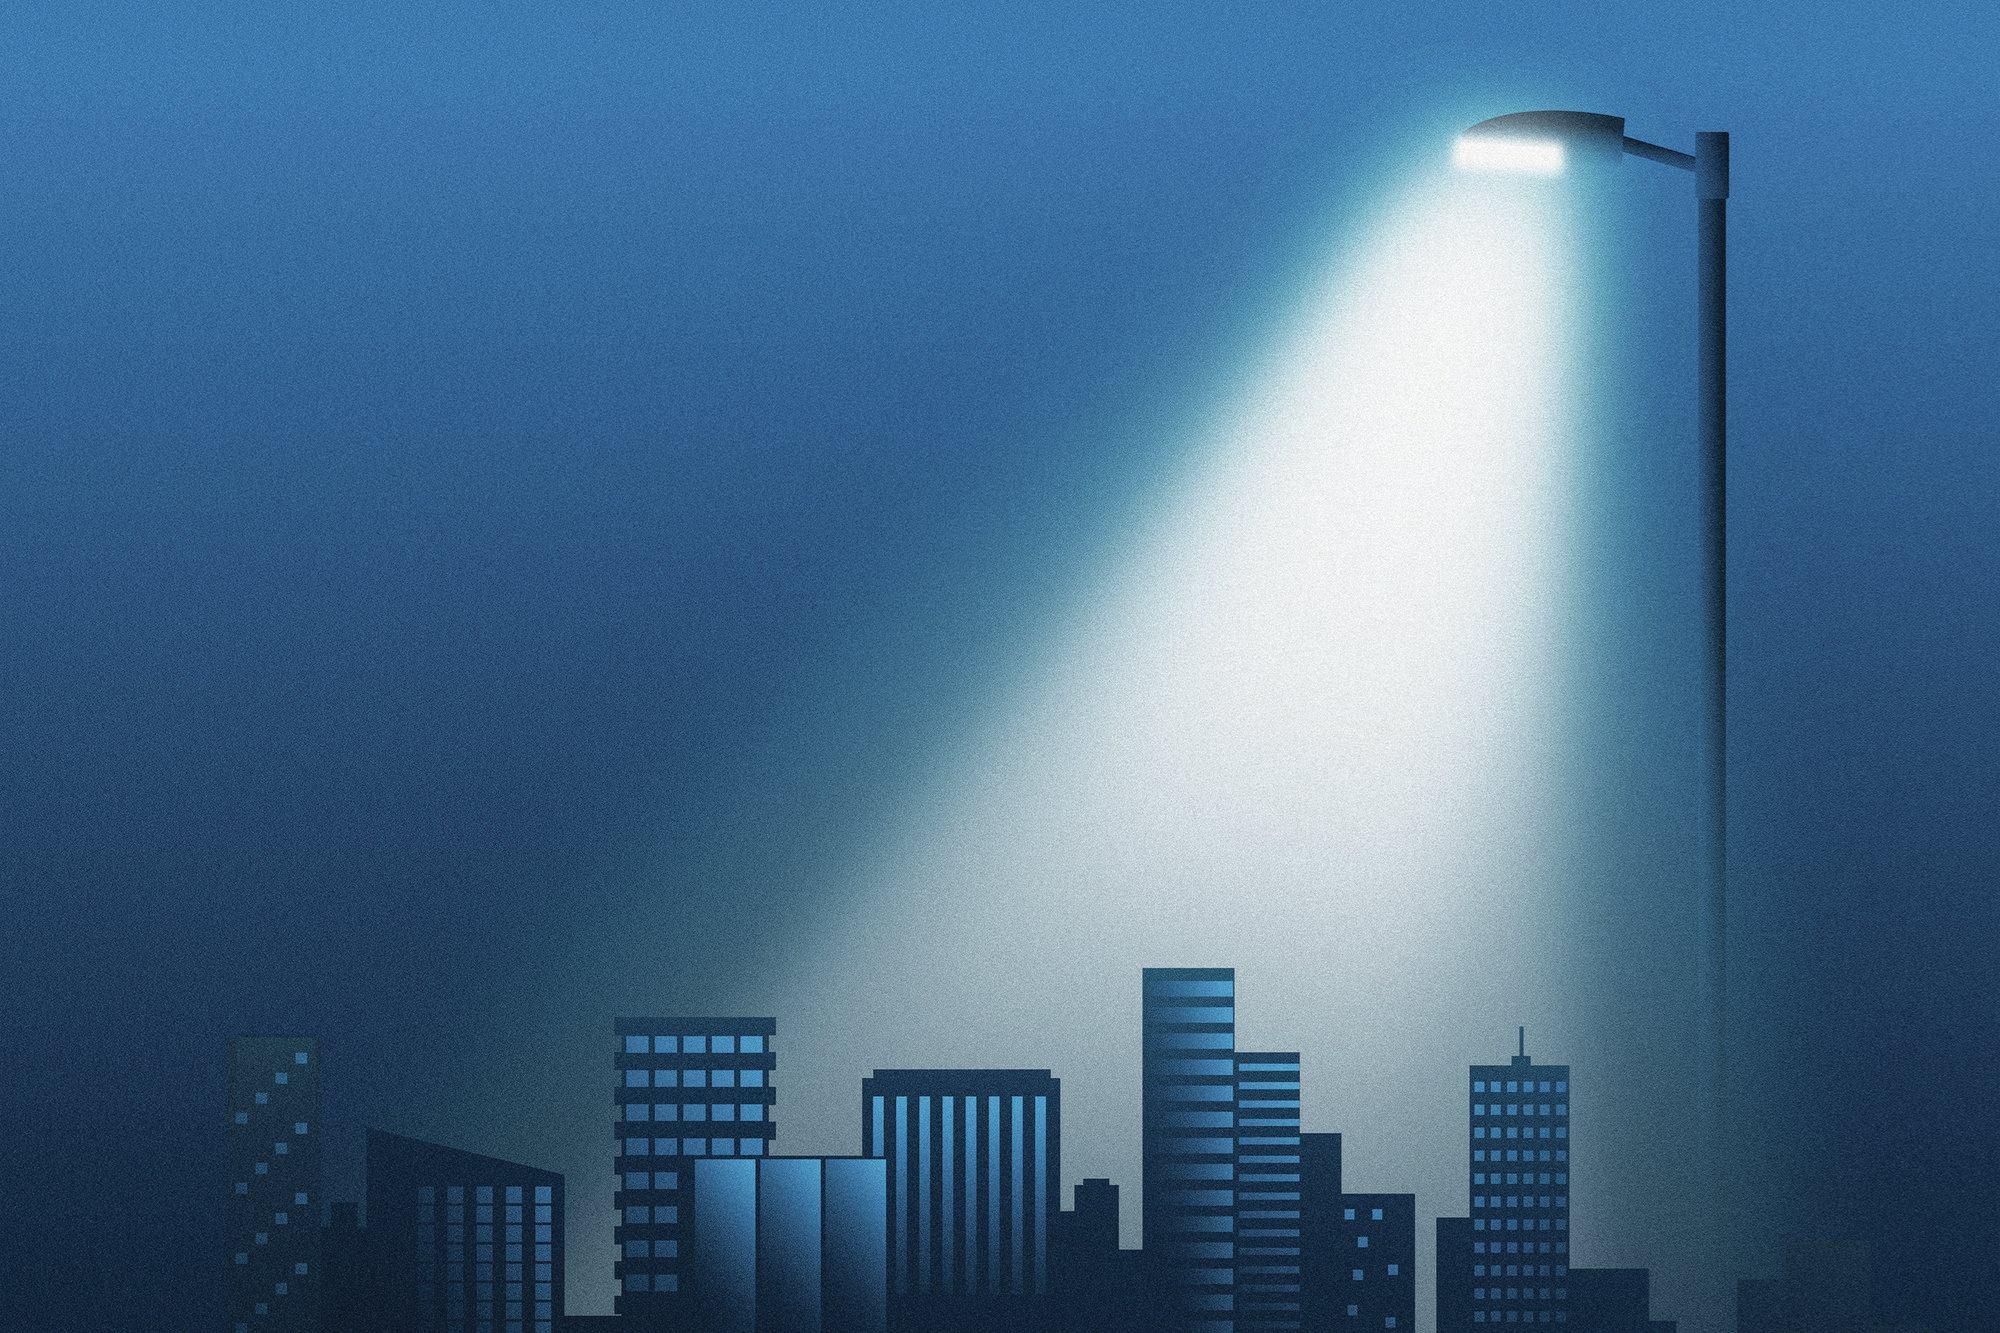 Lighting Leds Make Inroads Into Streetlighting Architectural Lighting